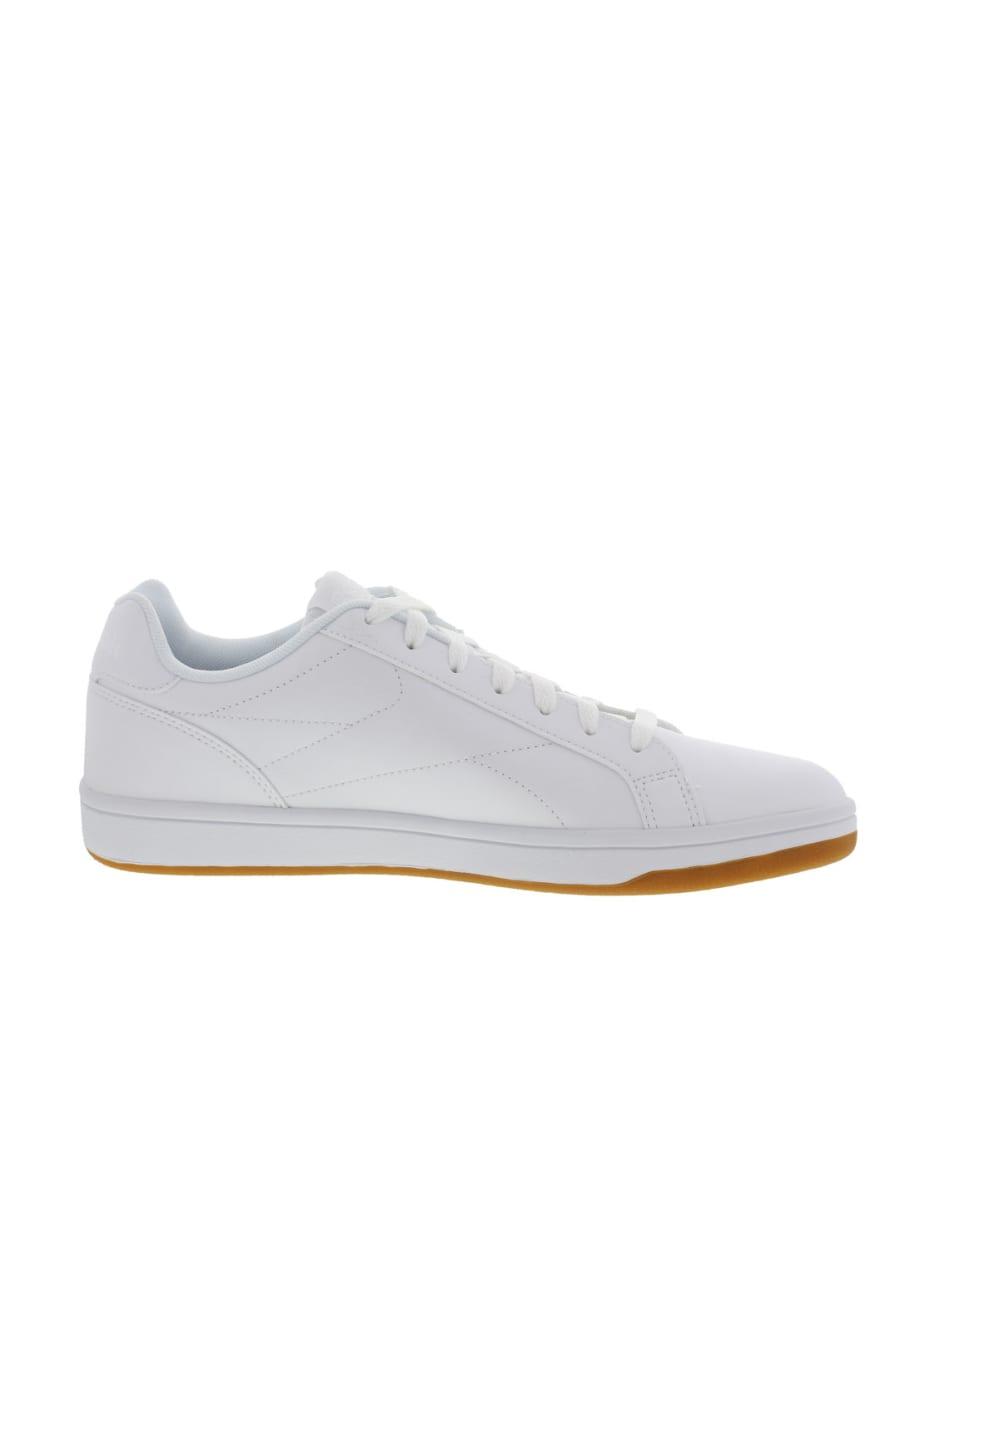 2f9ca88d1e60d8 Reebok Royal Complete Cln - Sneaker for Men - White | 21RUN